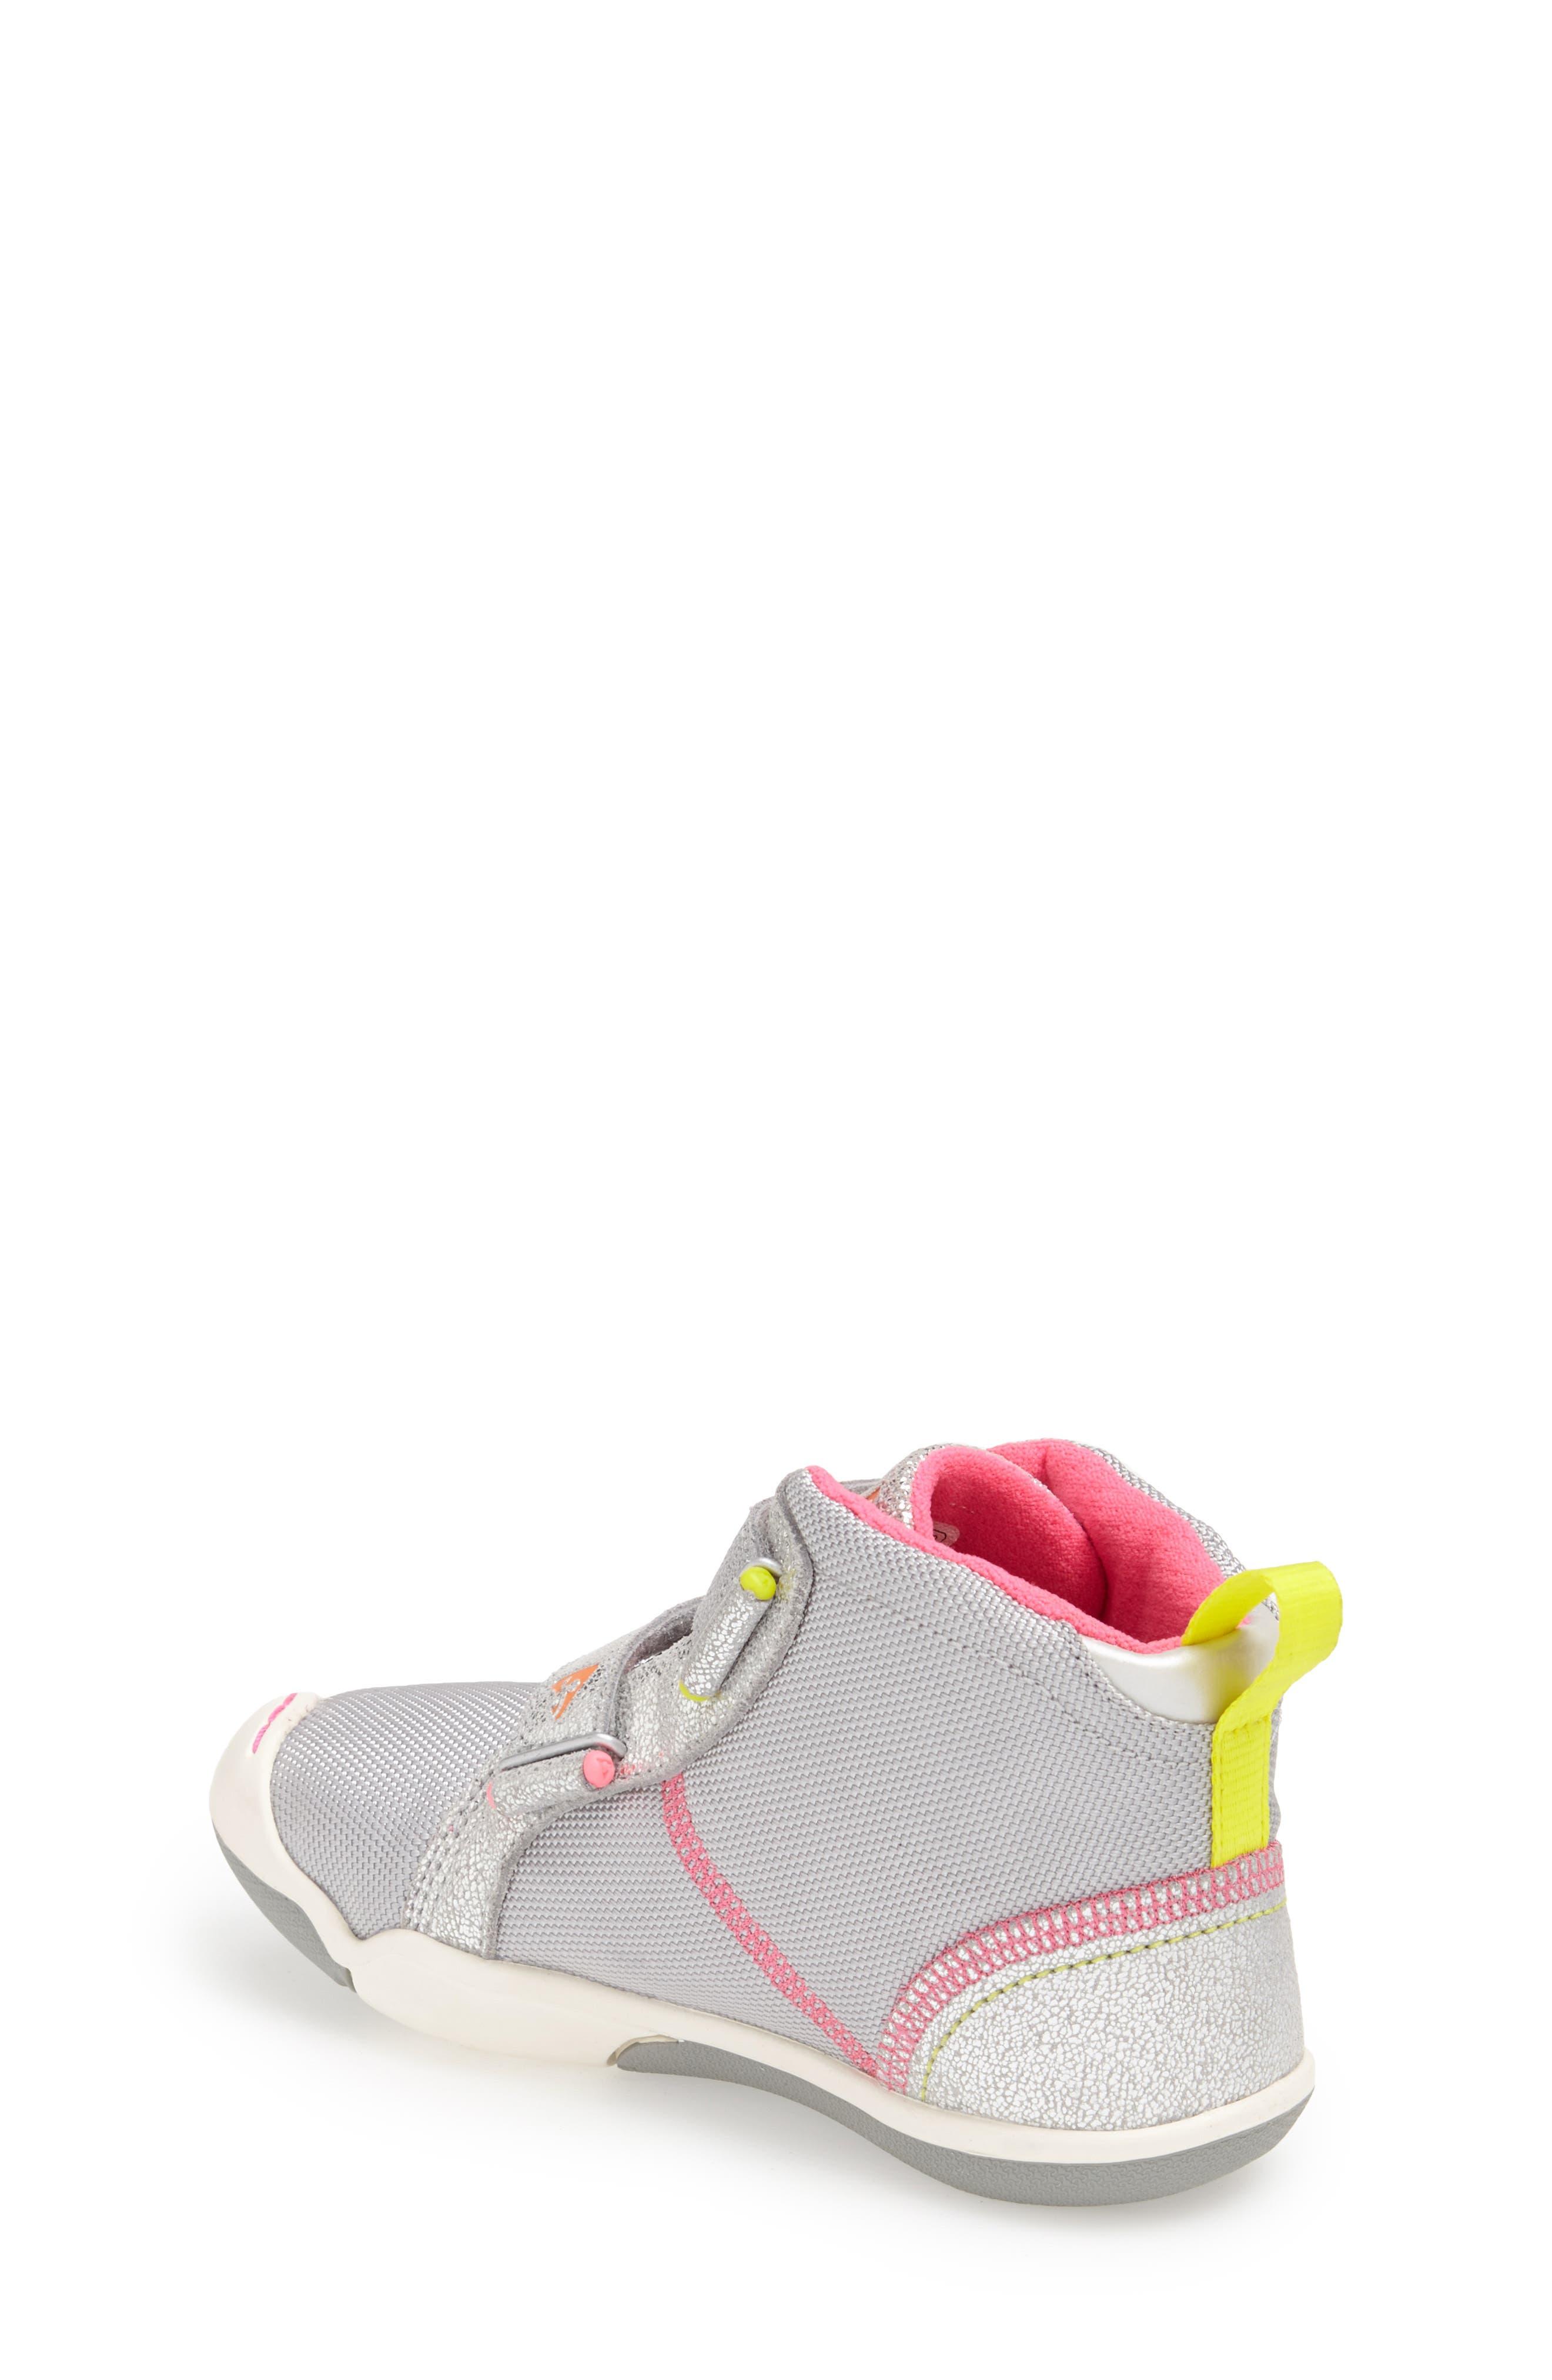 'Max' Customizable High Top Sneaker,                             Alternate thumbnail 4, color,                             040